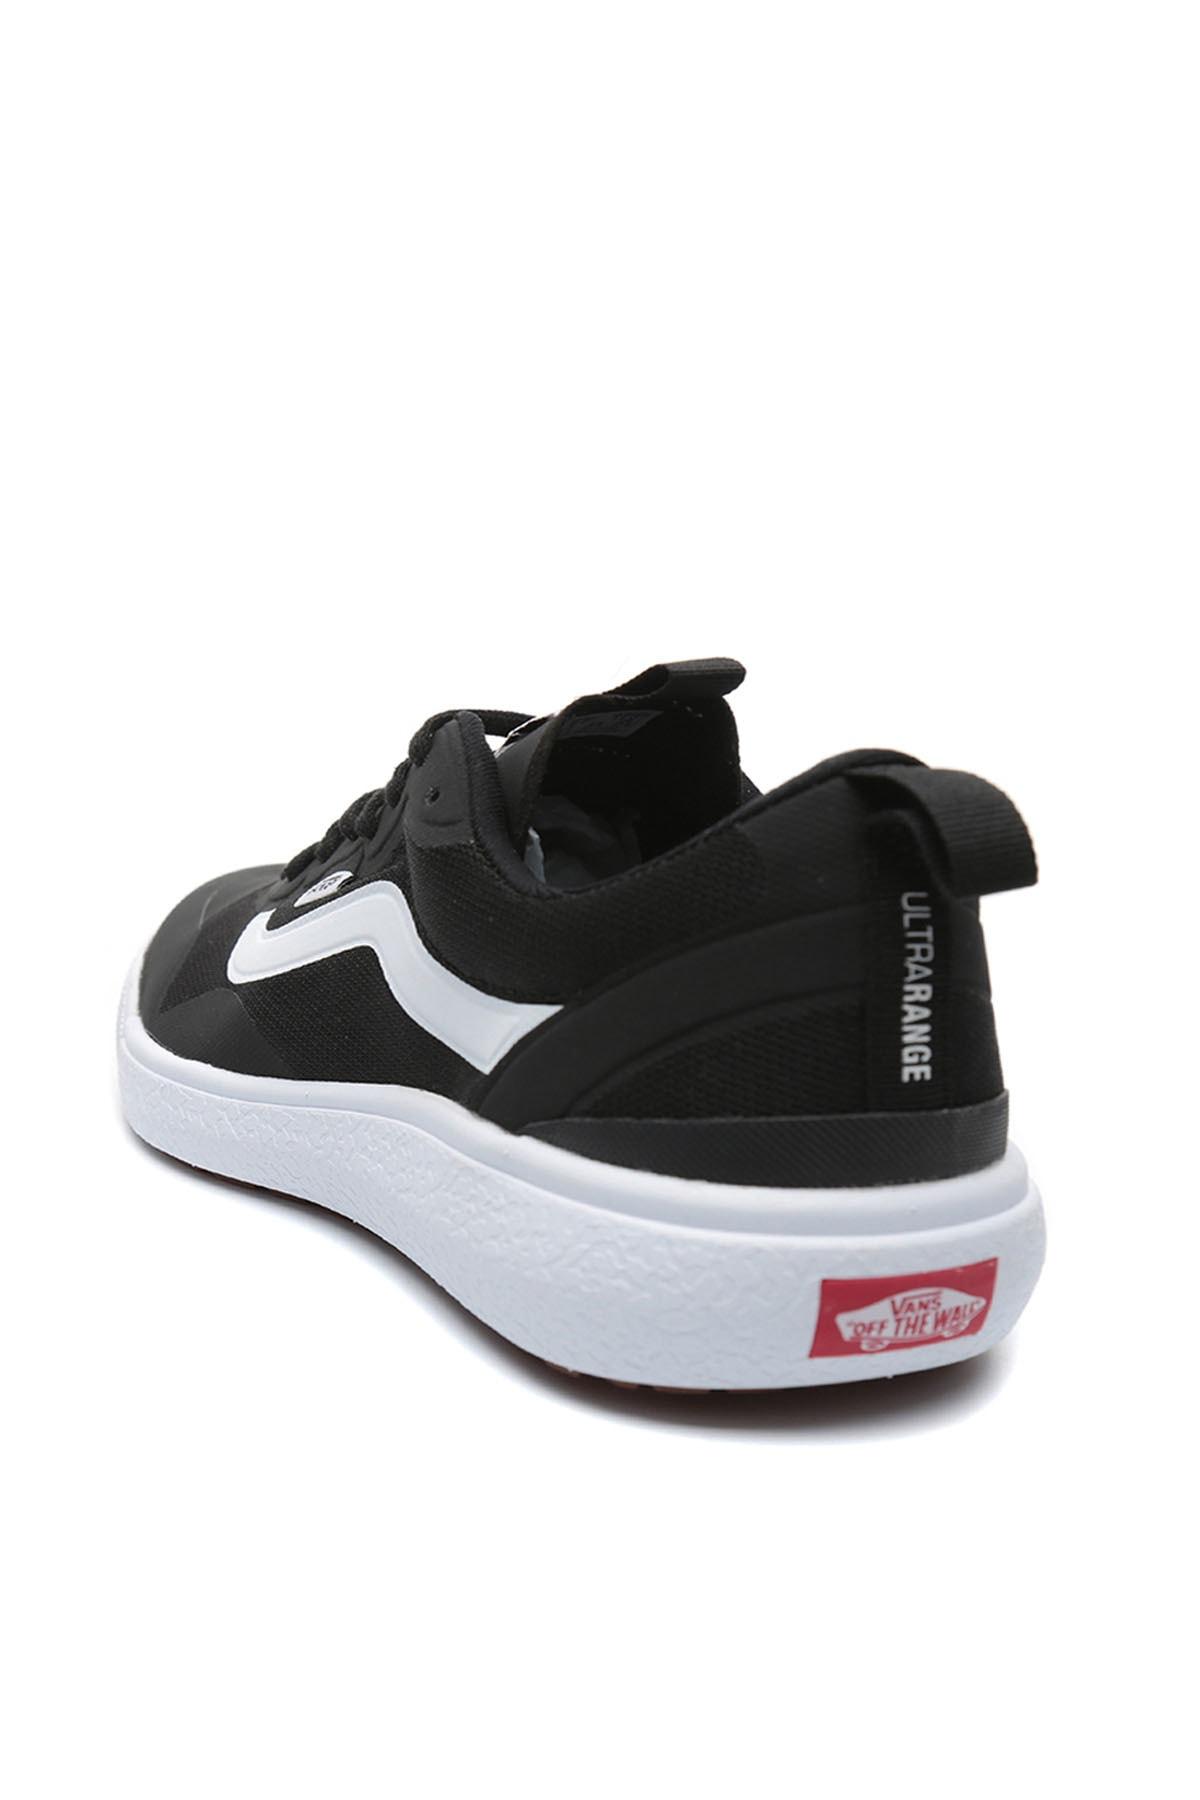 Vans Unisex Spor Ayakkabı - Ua Ultrarange Exo - 0A4U1KBLK1 3